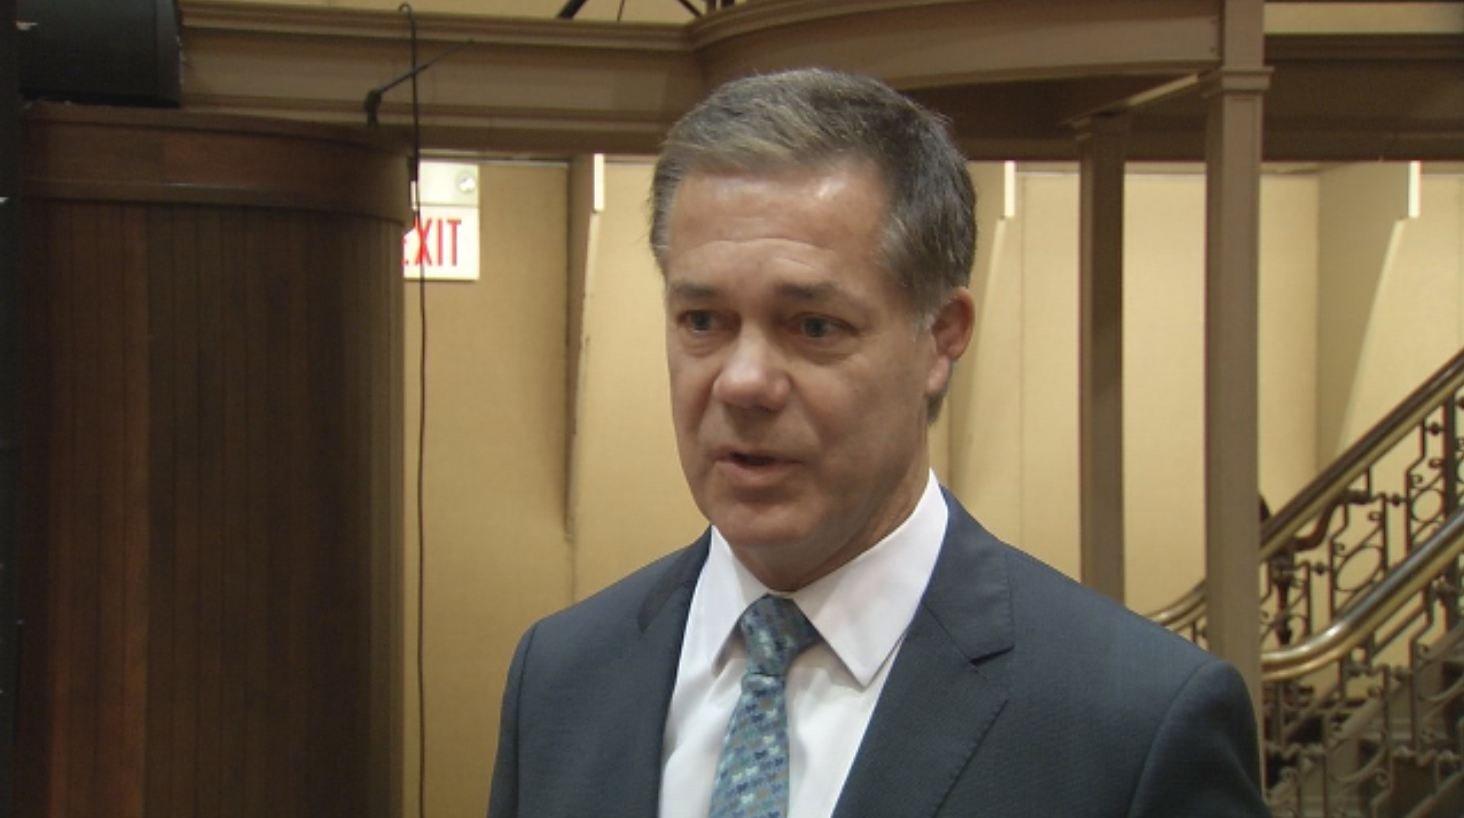 Greater Louisville Inc. CEO Kent Oyler